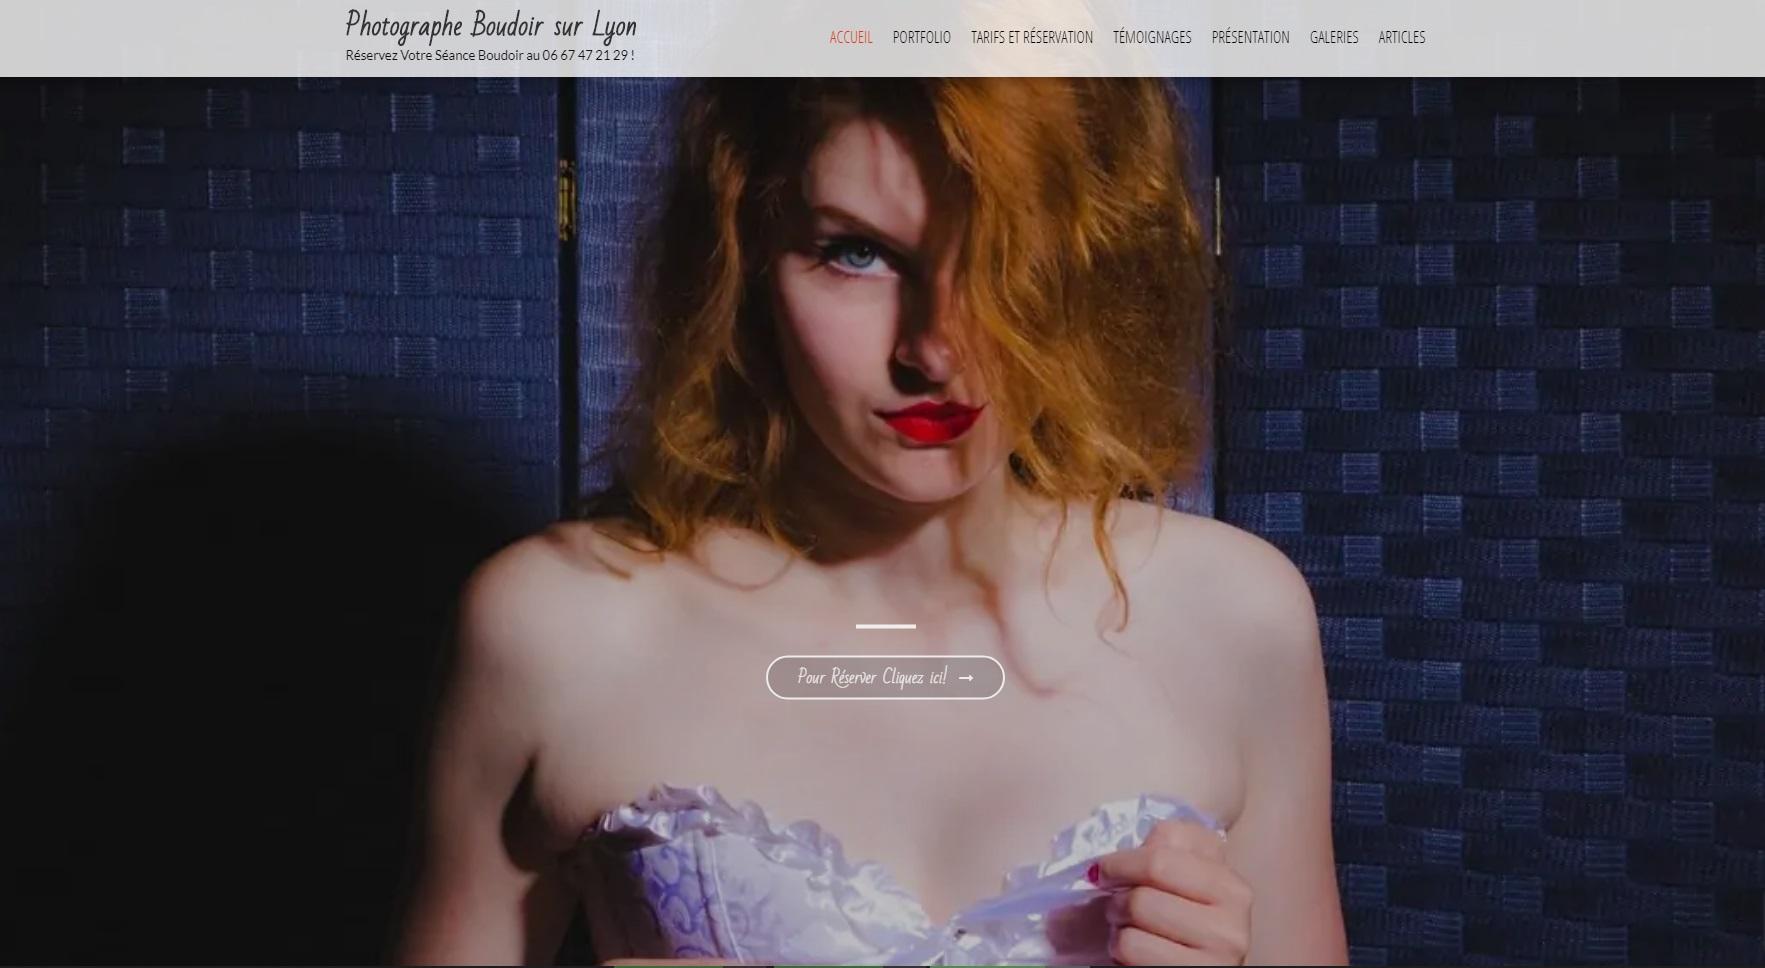 Blog Boudoir et Lingerie - Jonathan Bourrat